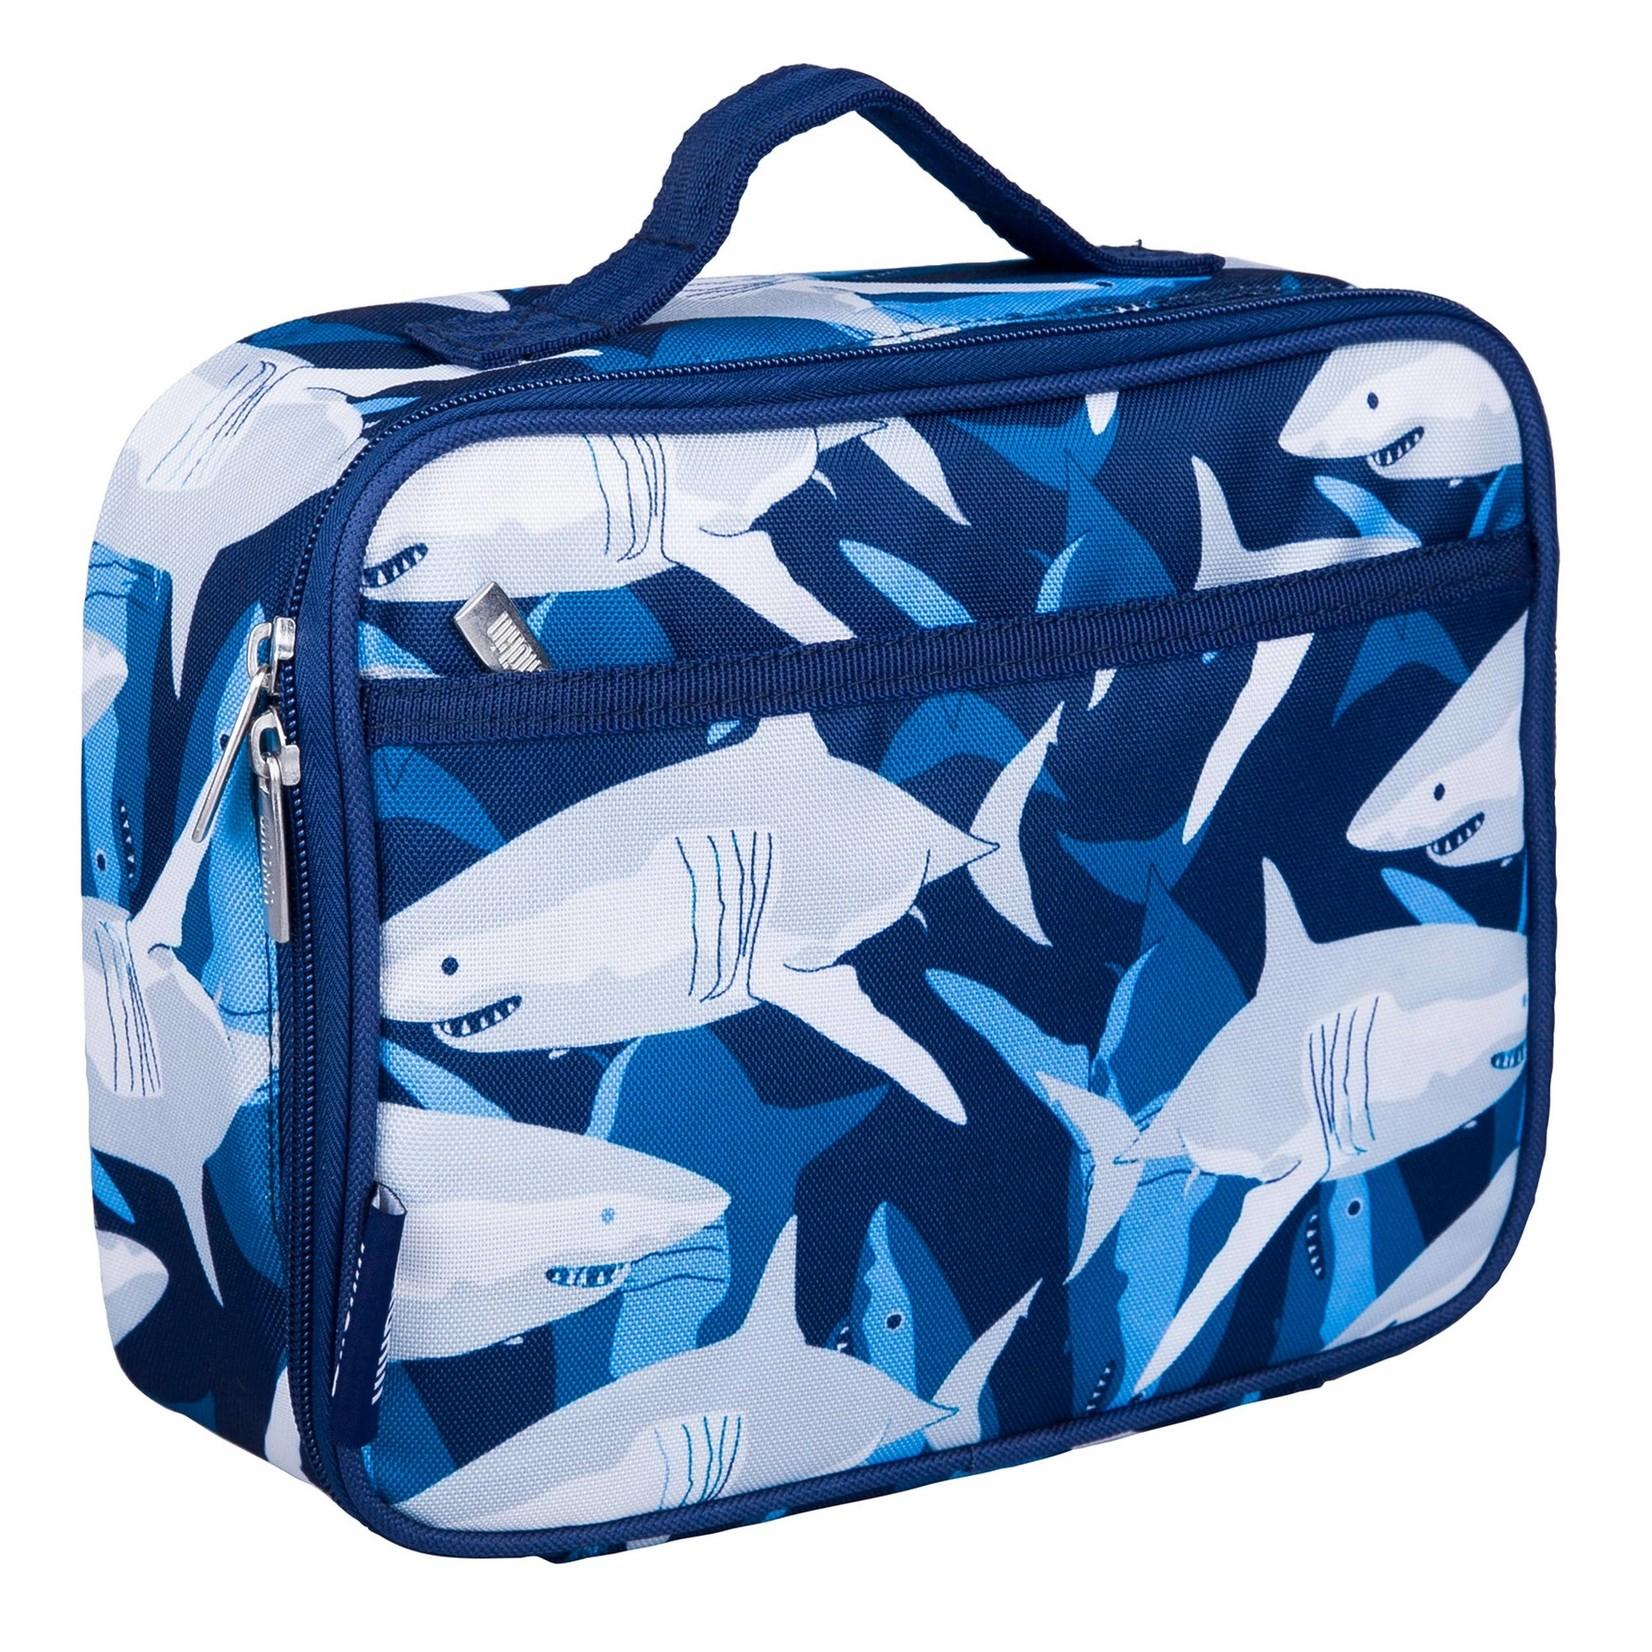 Sharks Lunch Box